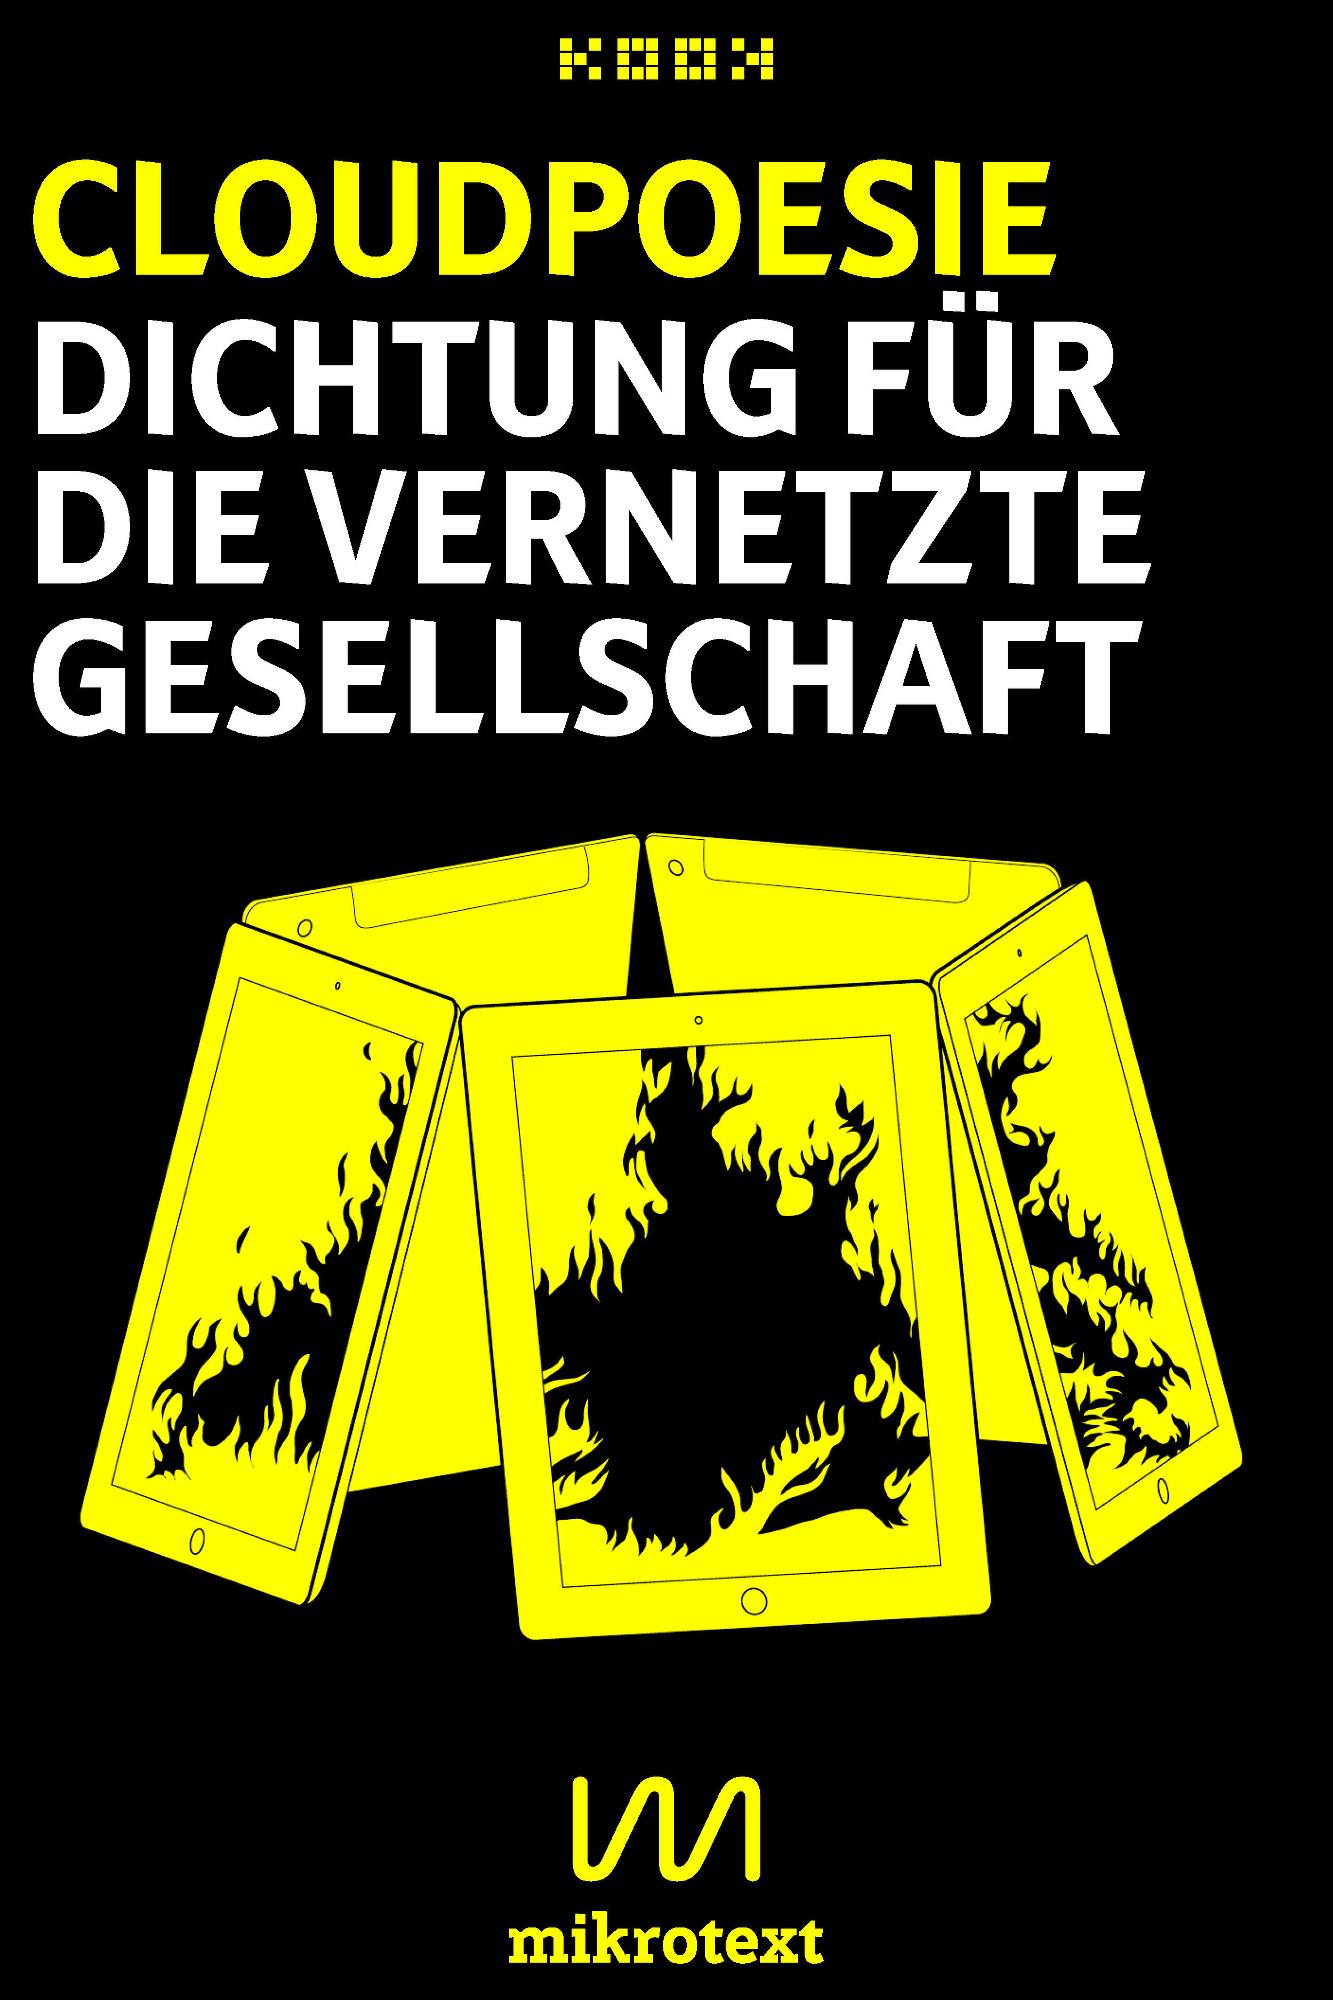 Cover_Cloudpoesie_Dichtung_fuer_die_vernetzte_Gesellschaft_mikrotext_KOOK